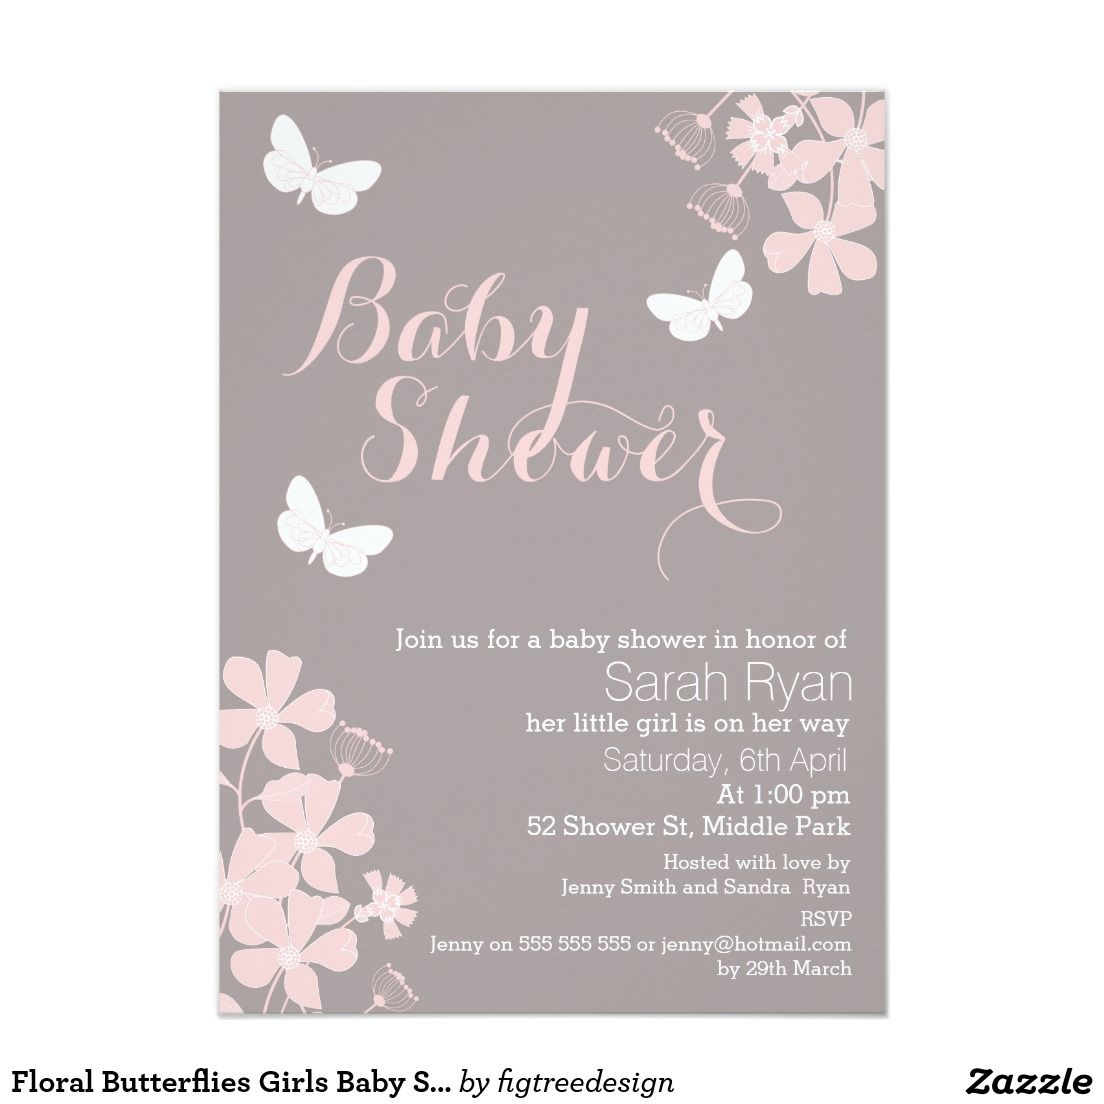 Floral Butterflies Girls Baby Shower Invitation | Baby shower ...